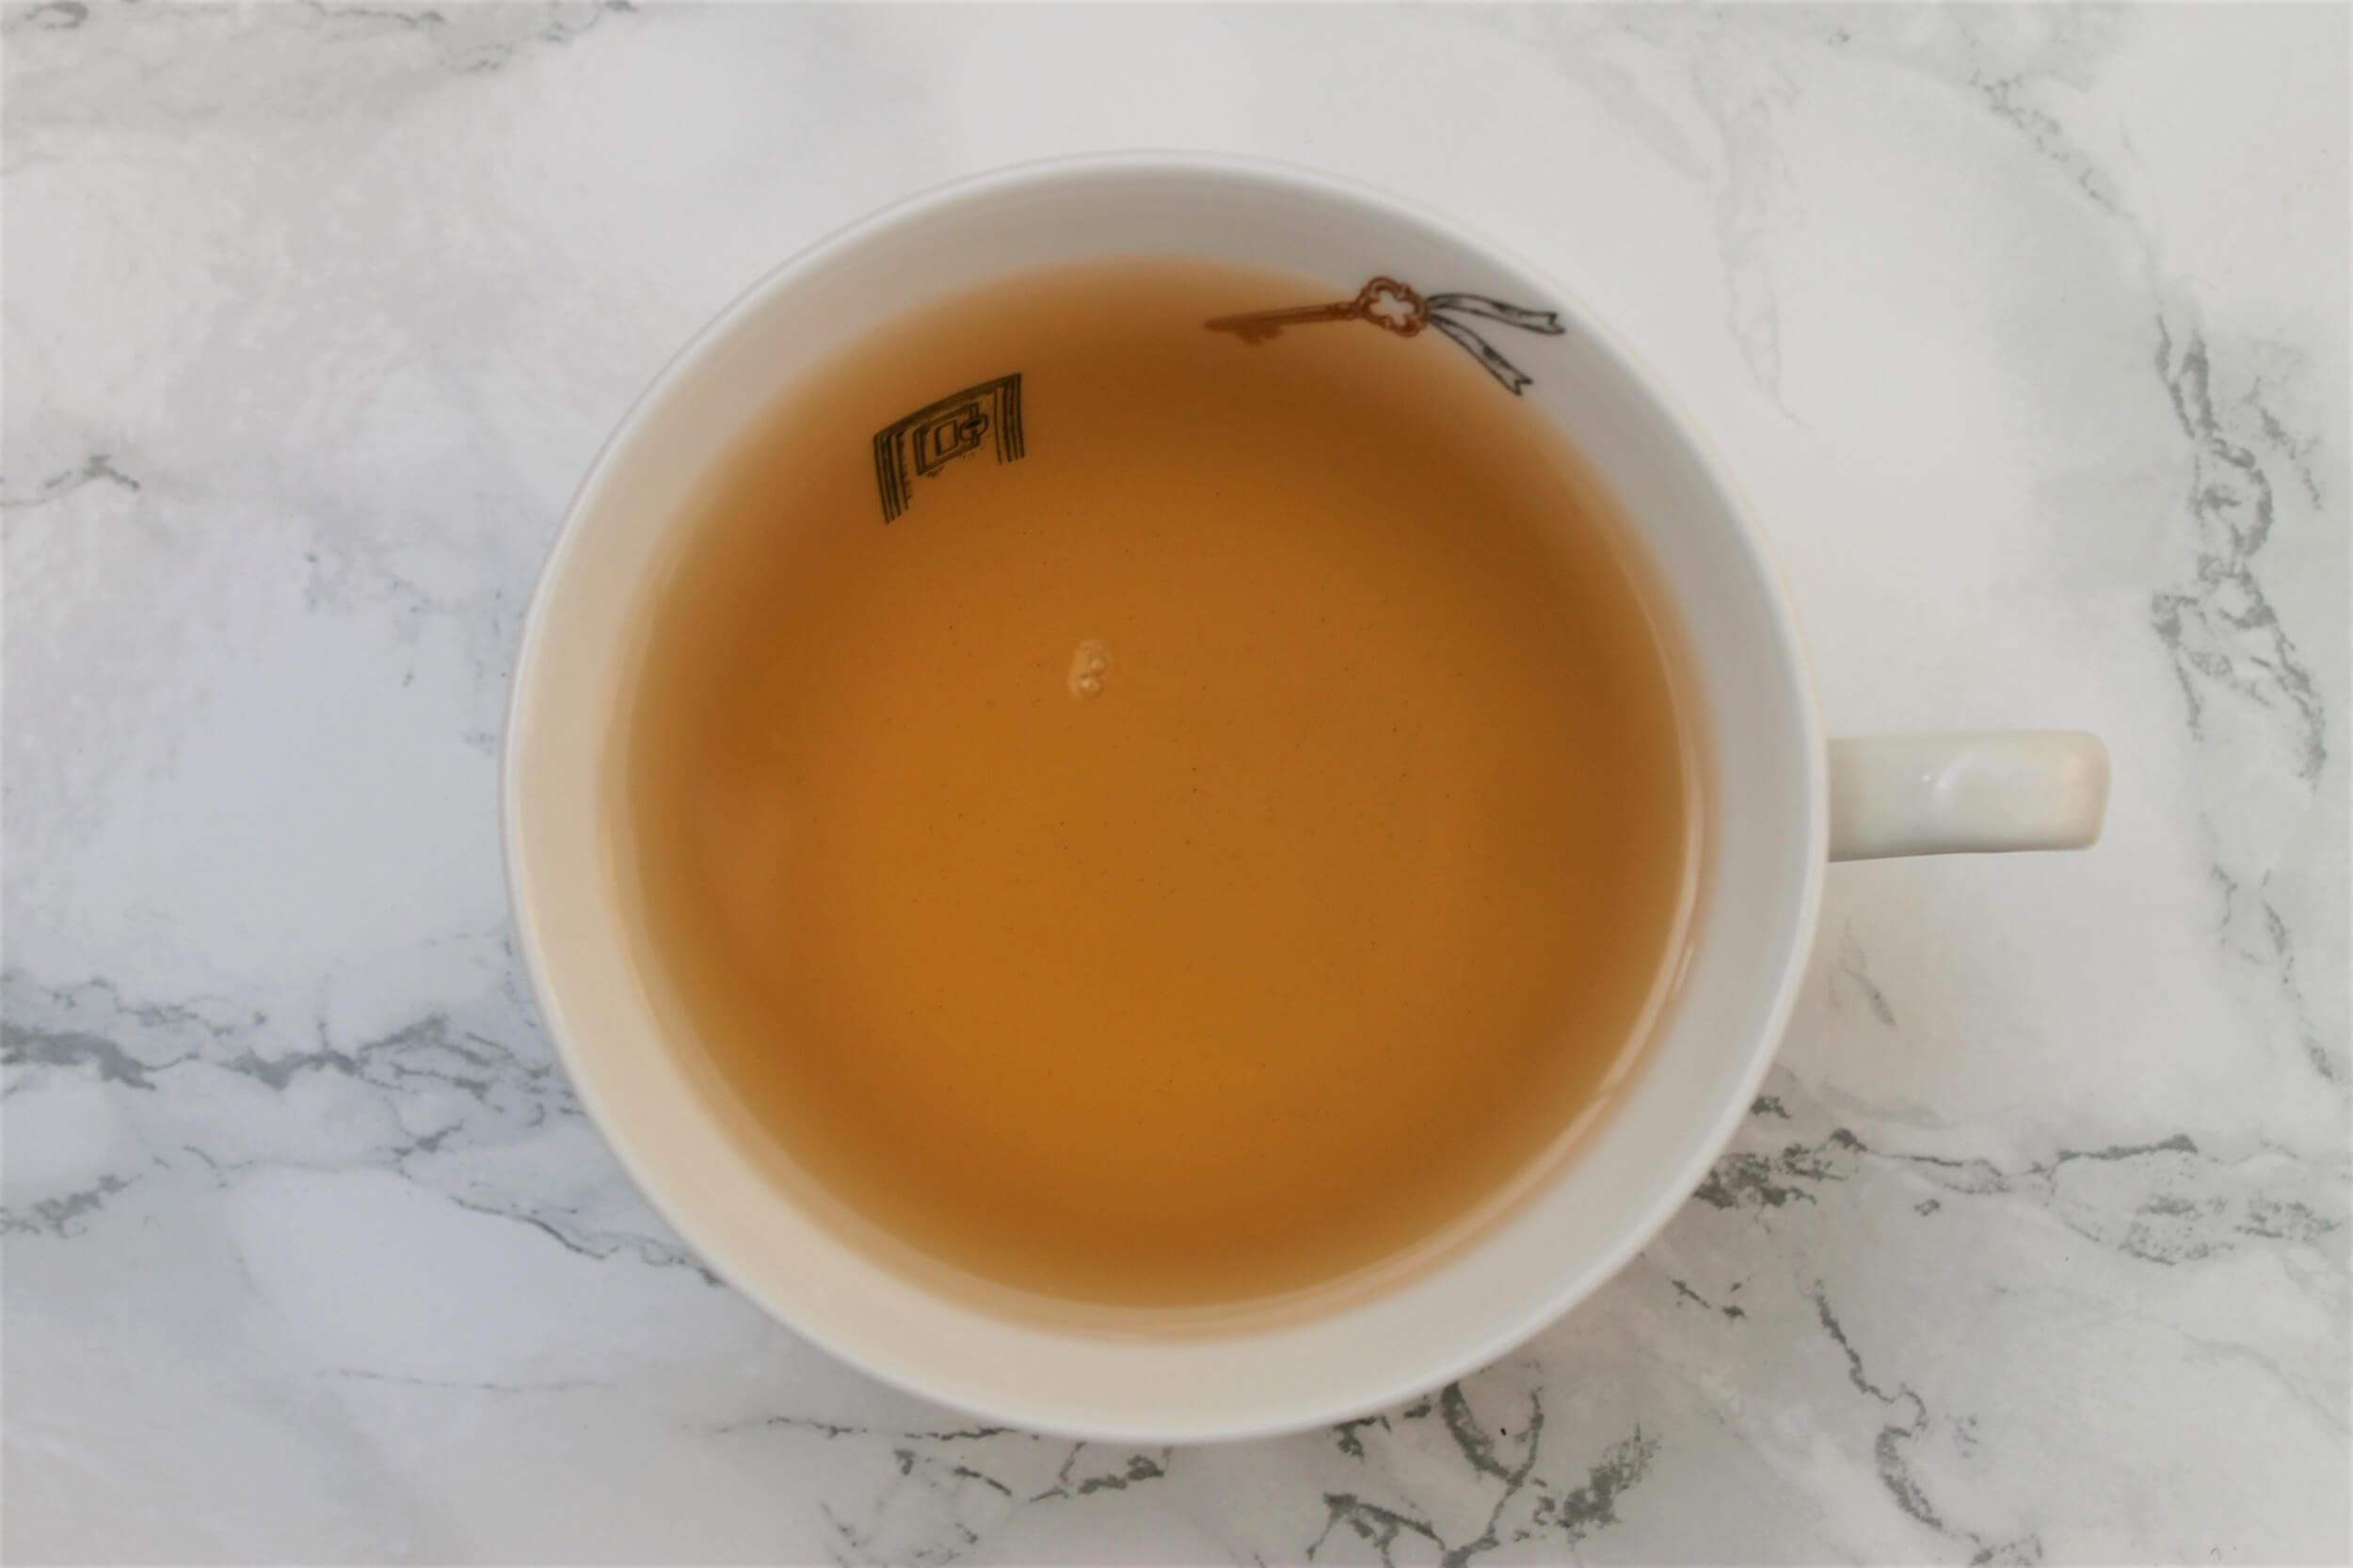 tesco green tea with pomegranate